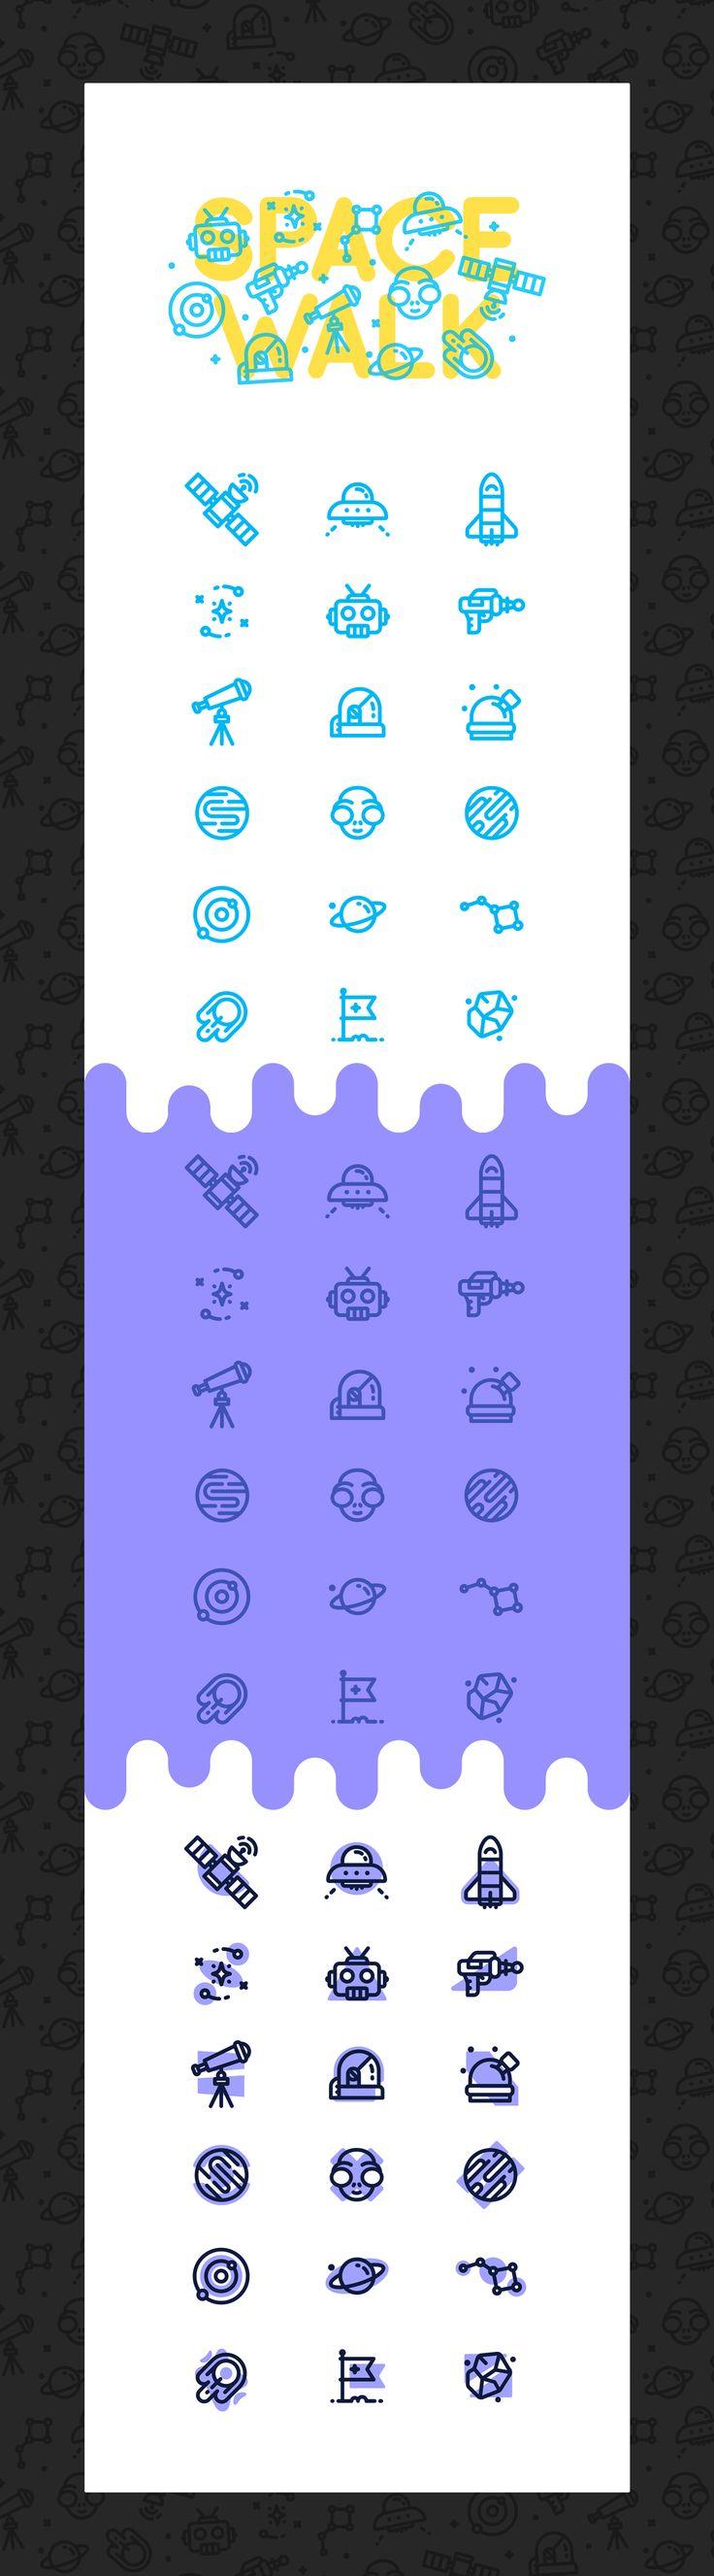 SpaceWalk / Icons & Patterns on Behance